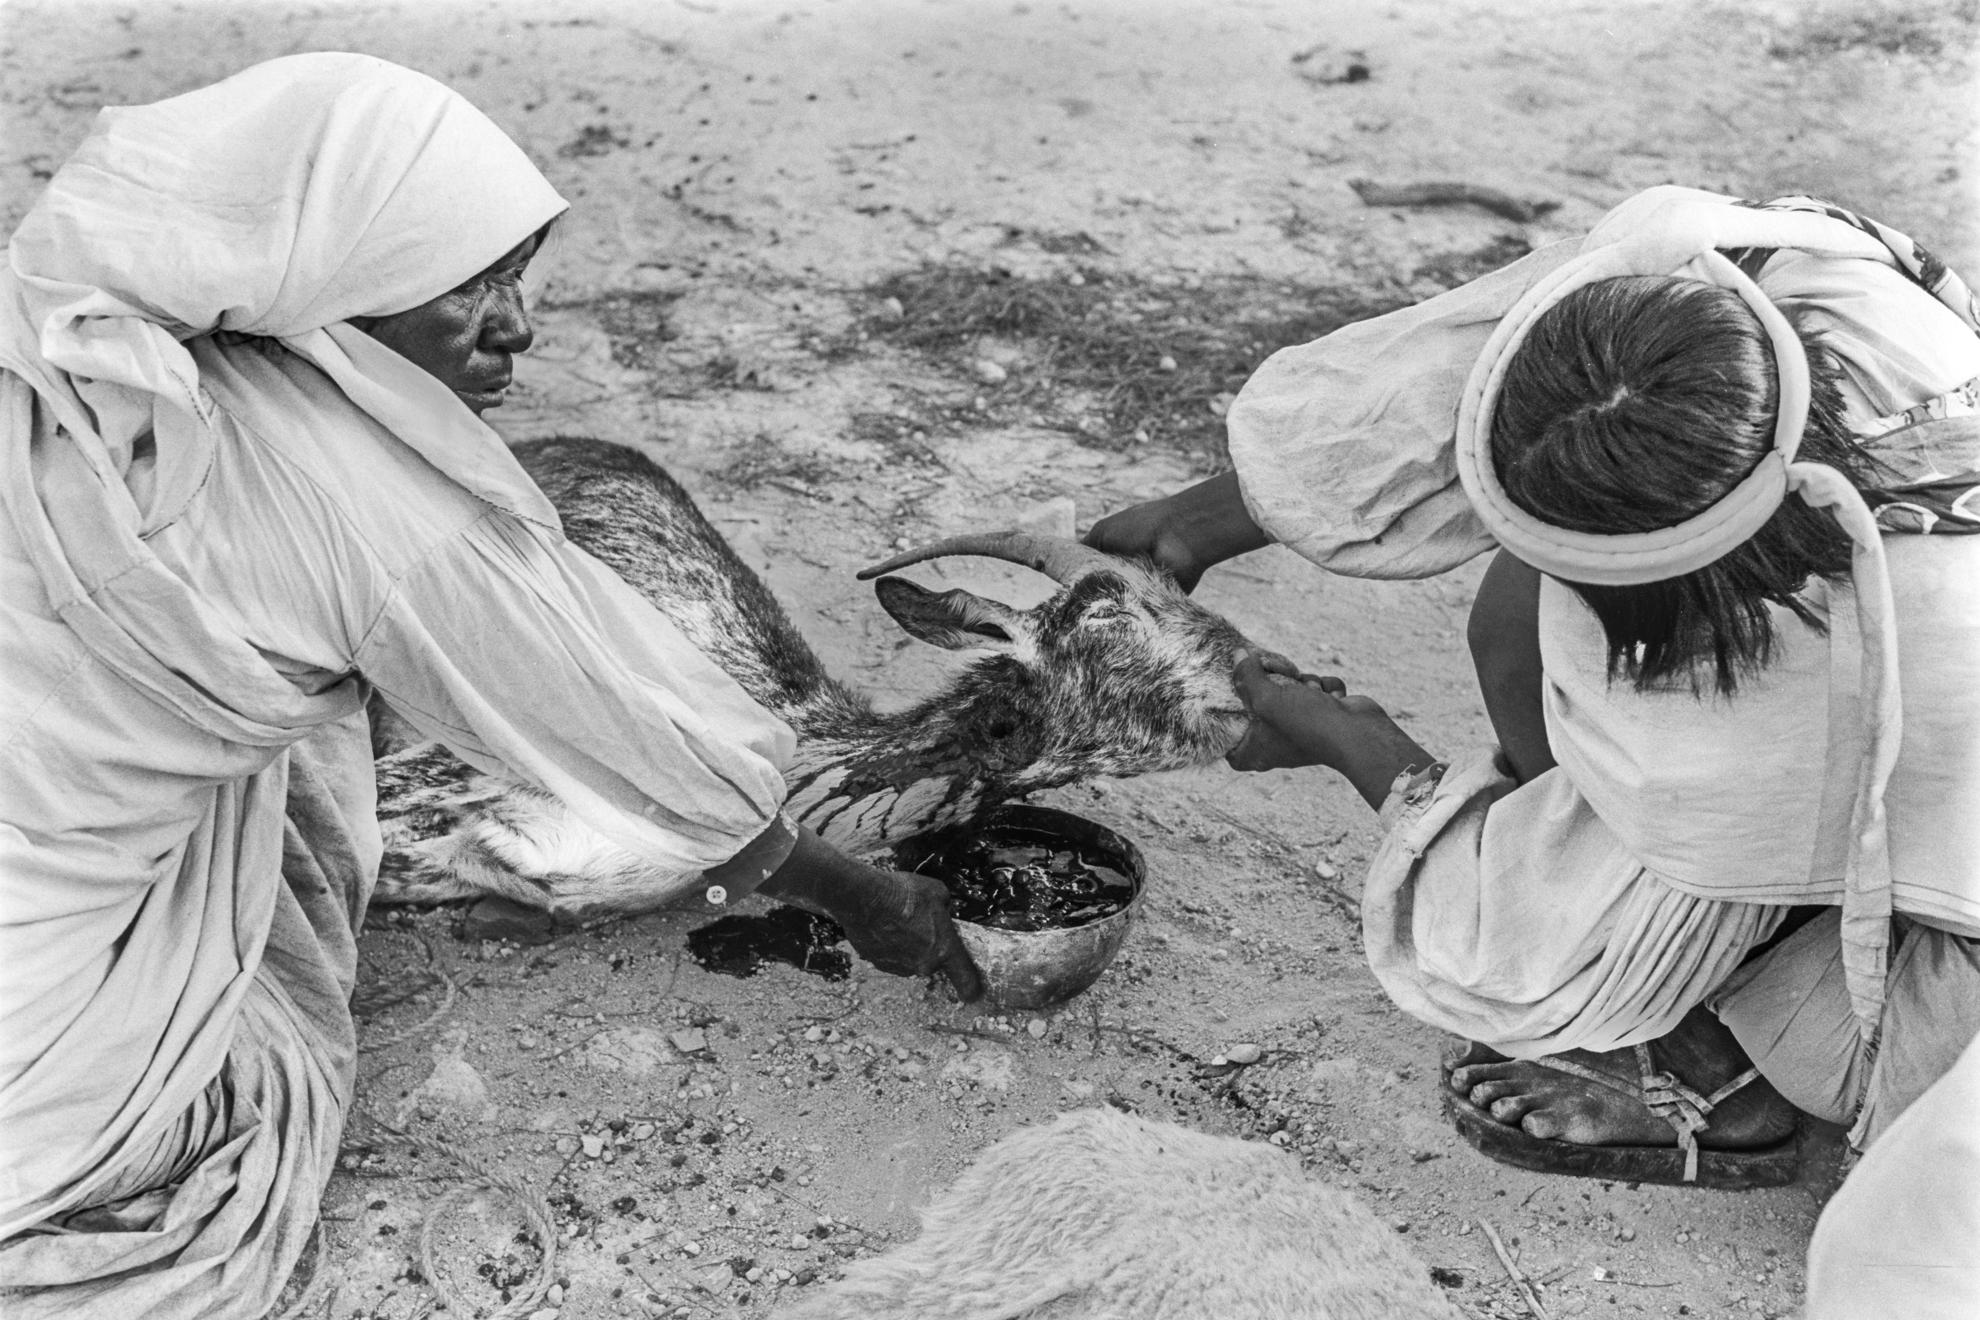 Sacrificing a goat for Ramali